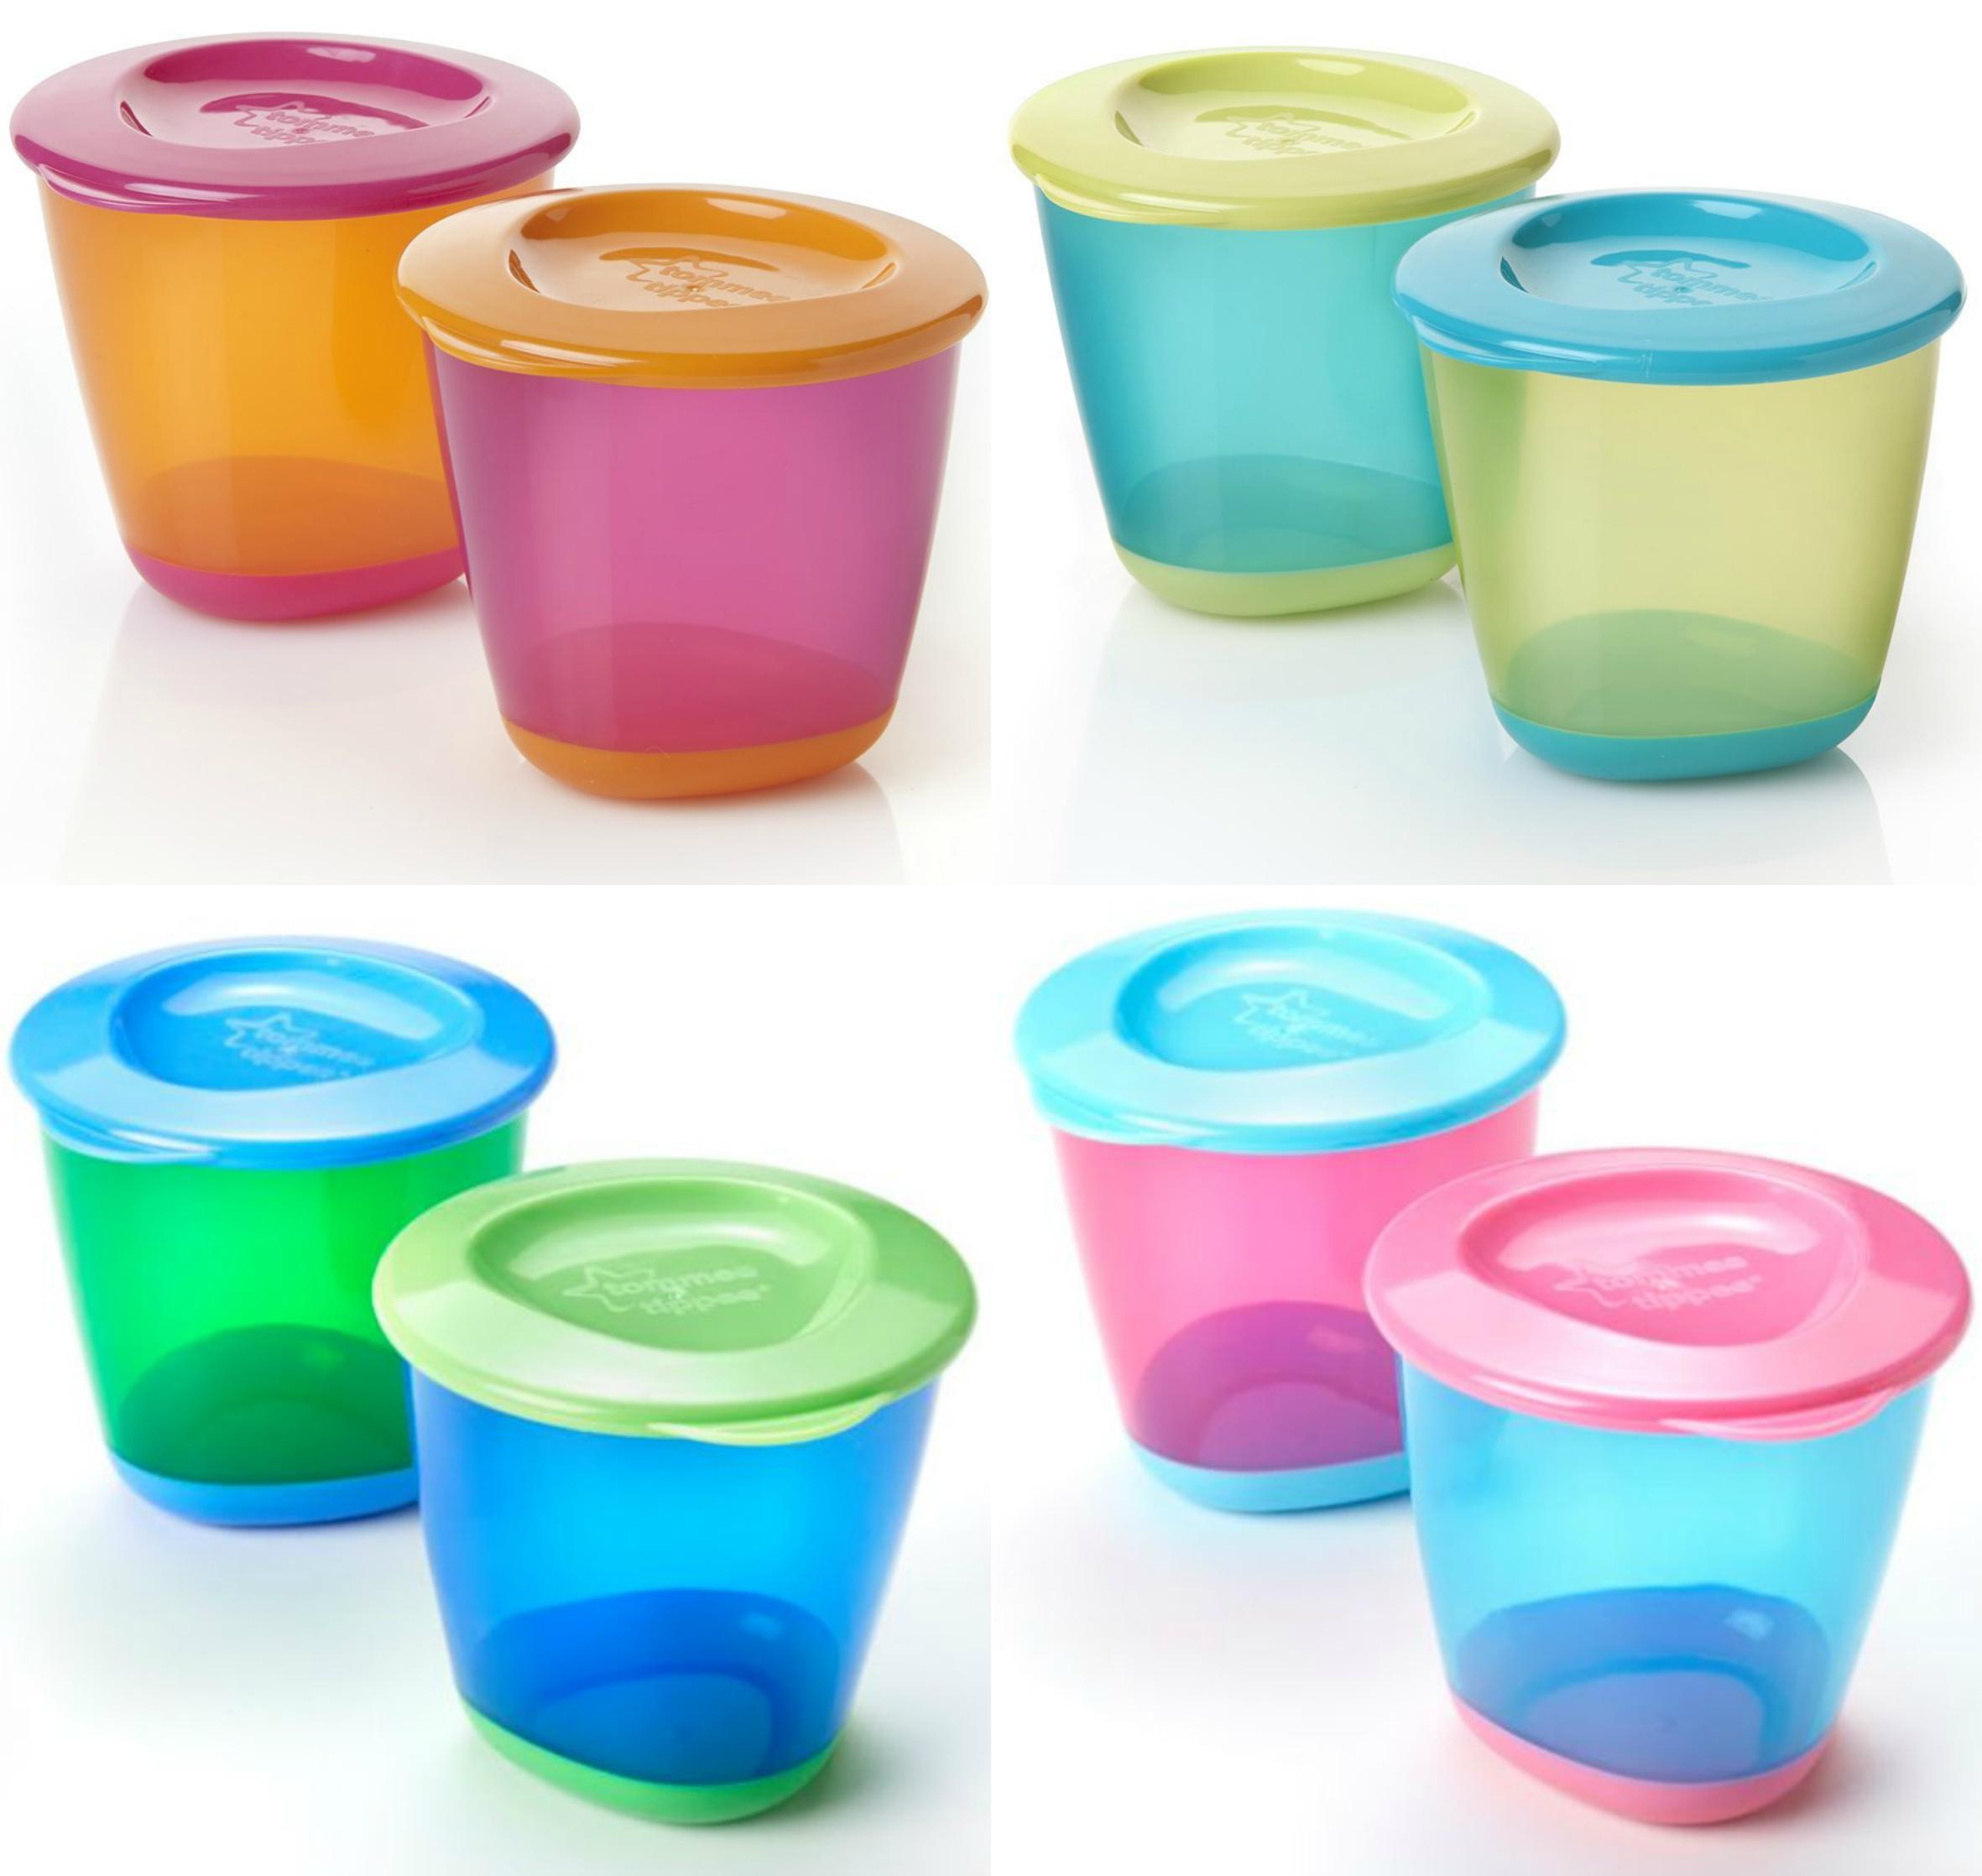 Tommee Tippee Explora 4oz Pop Up Weaning Pots Baby Food